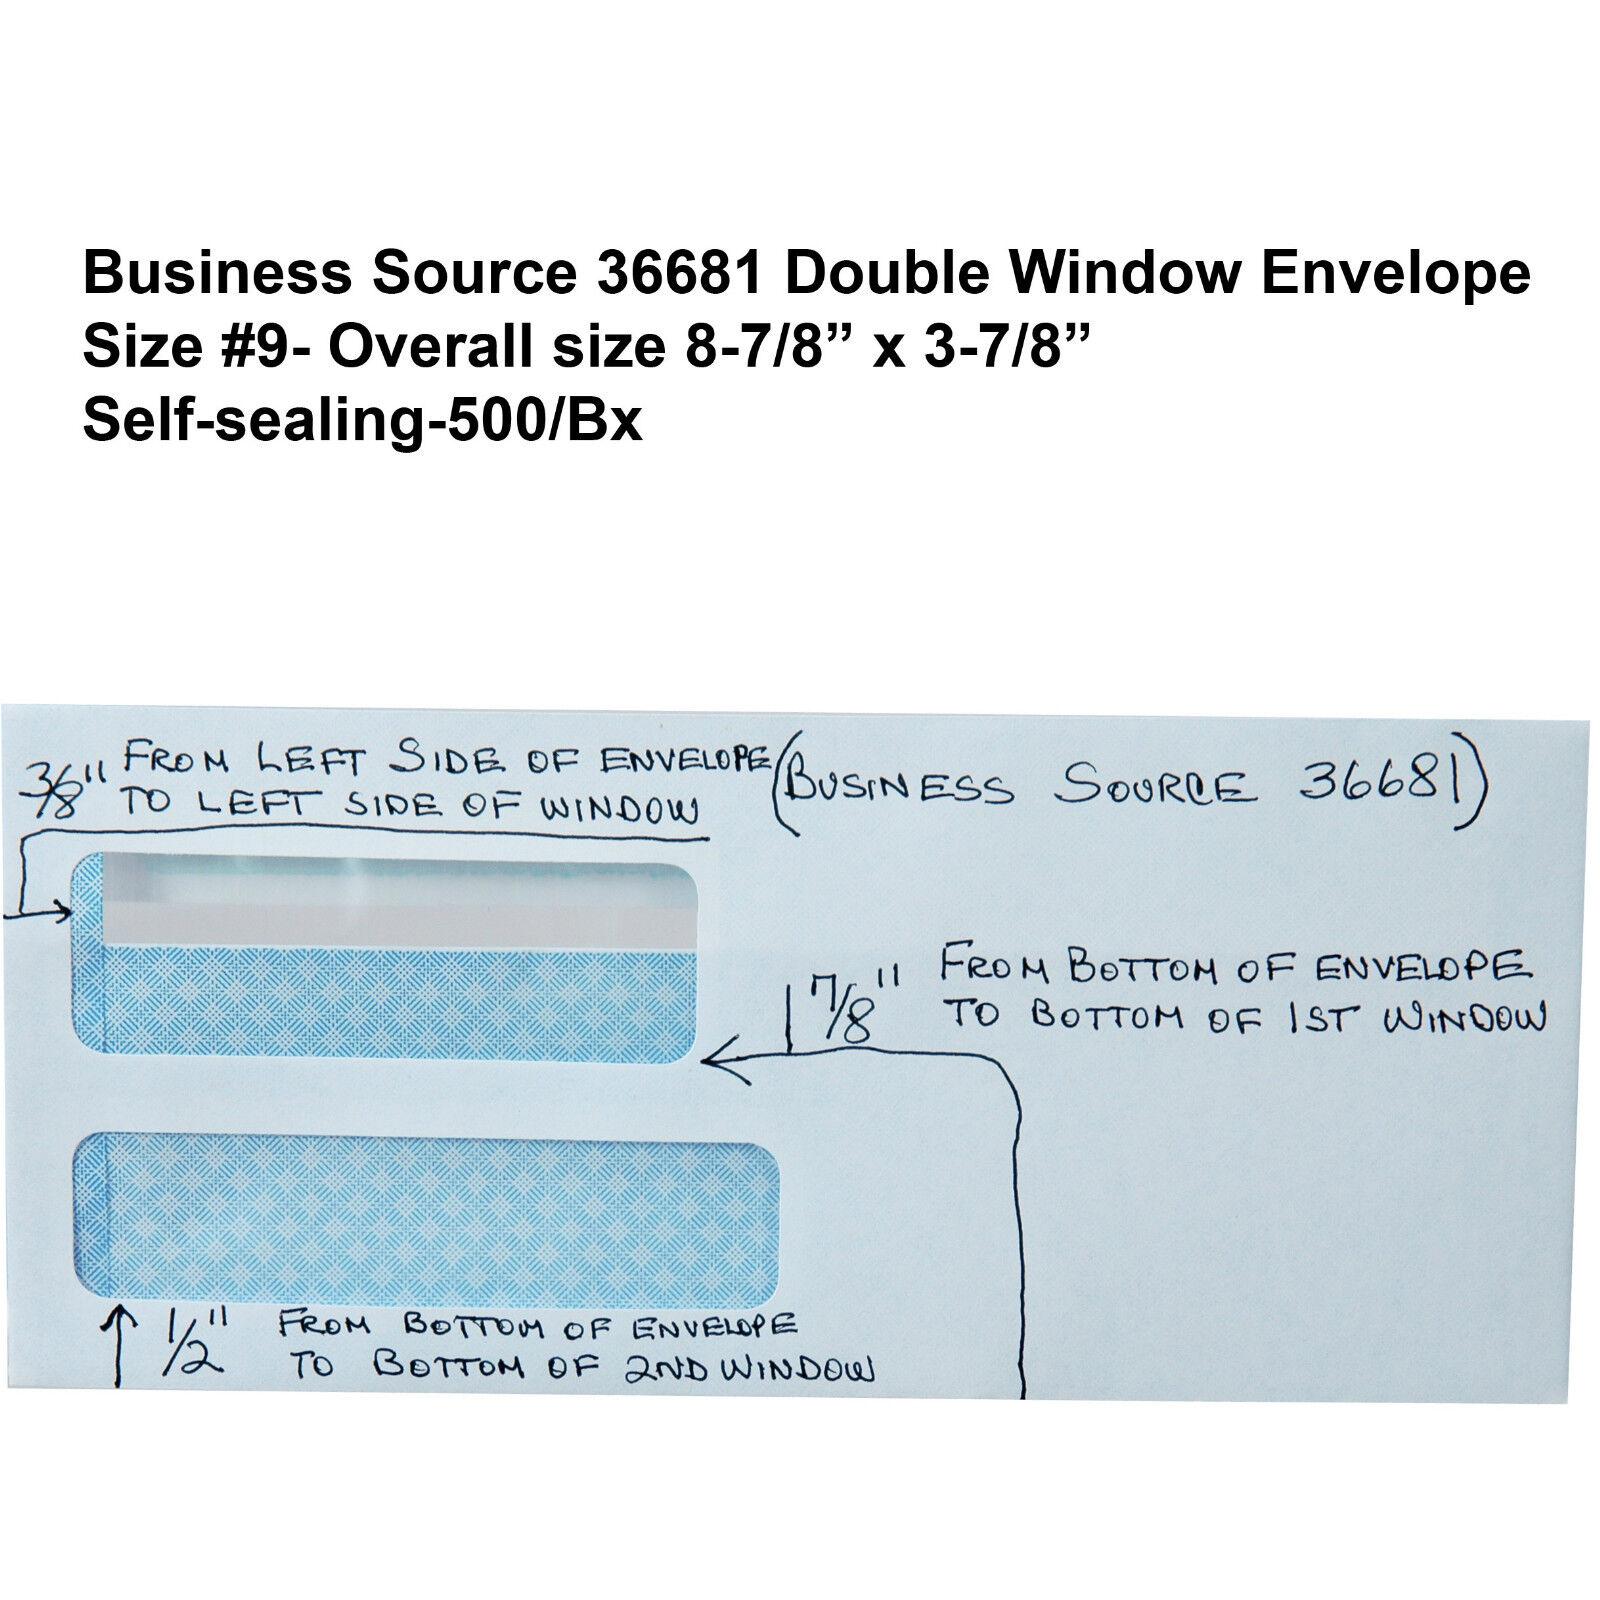 Business Source No Double Window Invoice Envelopes EBay - 9 invoice envelopes